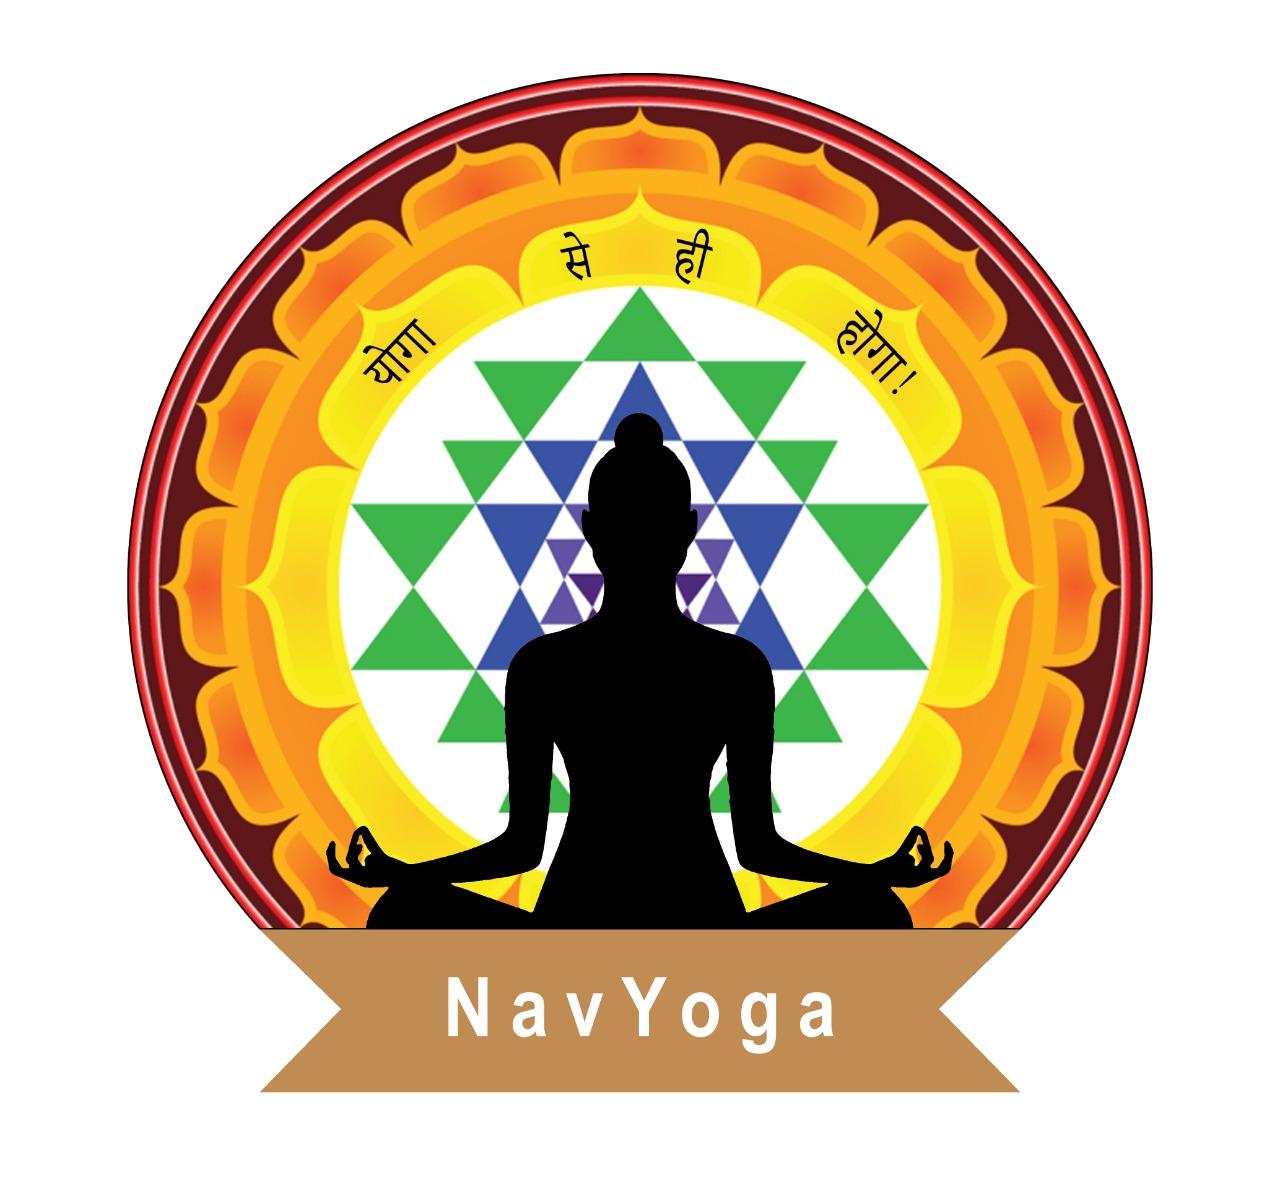 NavYoga Fitness Studio